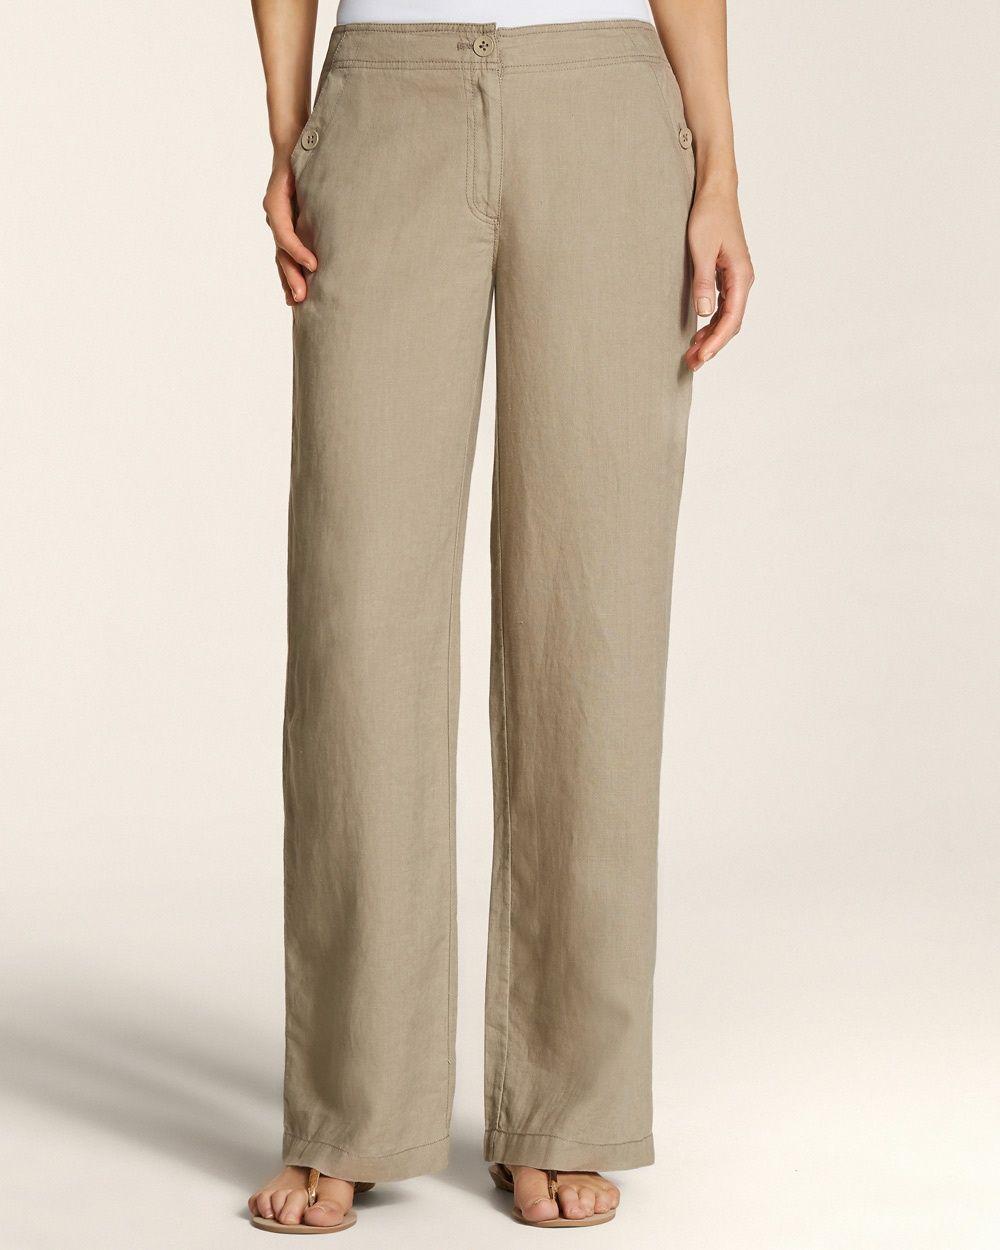 Chico's Women's Linen Wide Leg Pants,